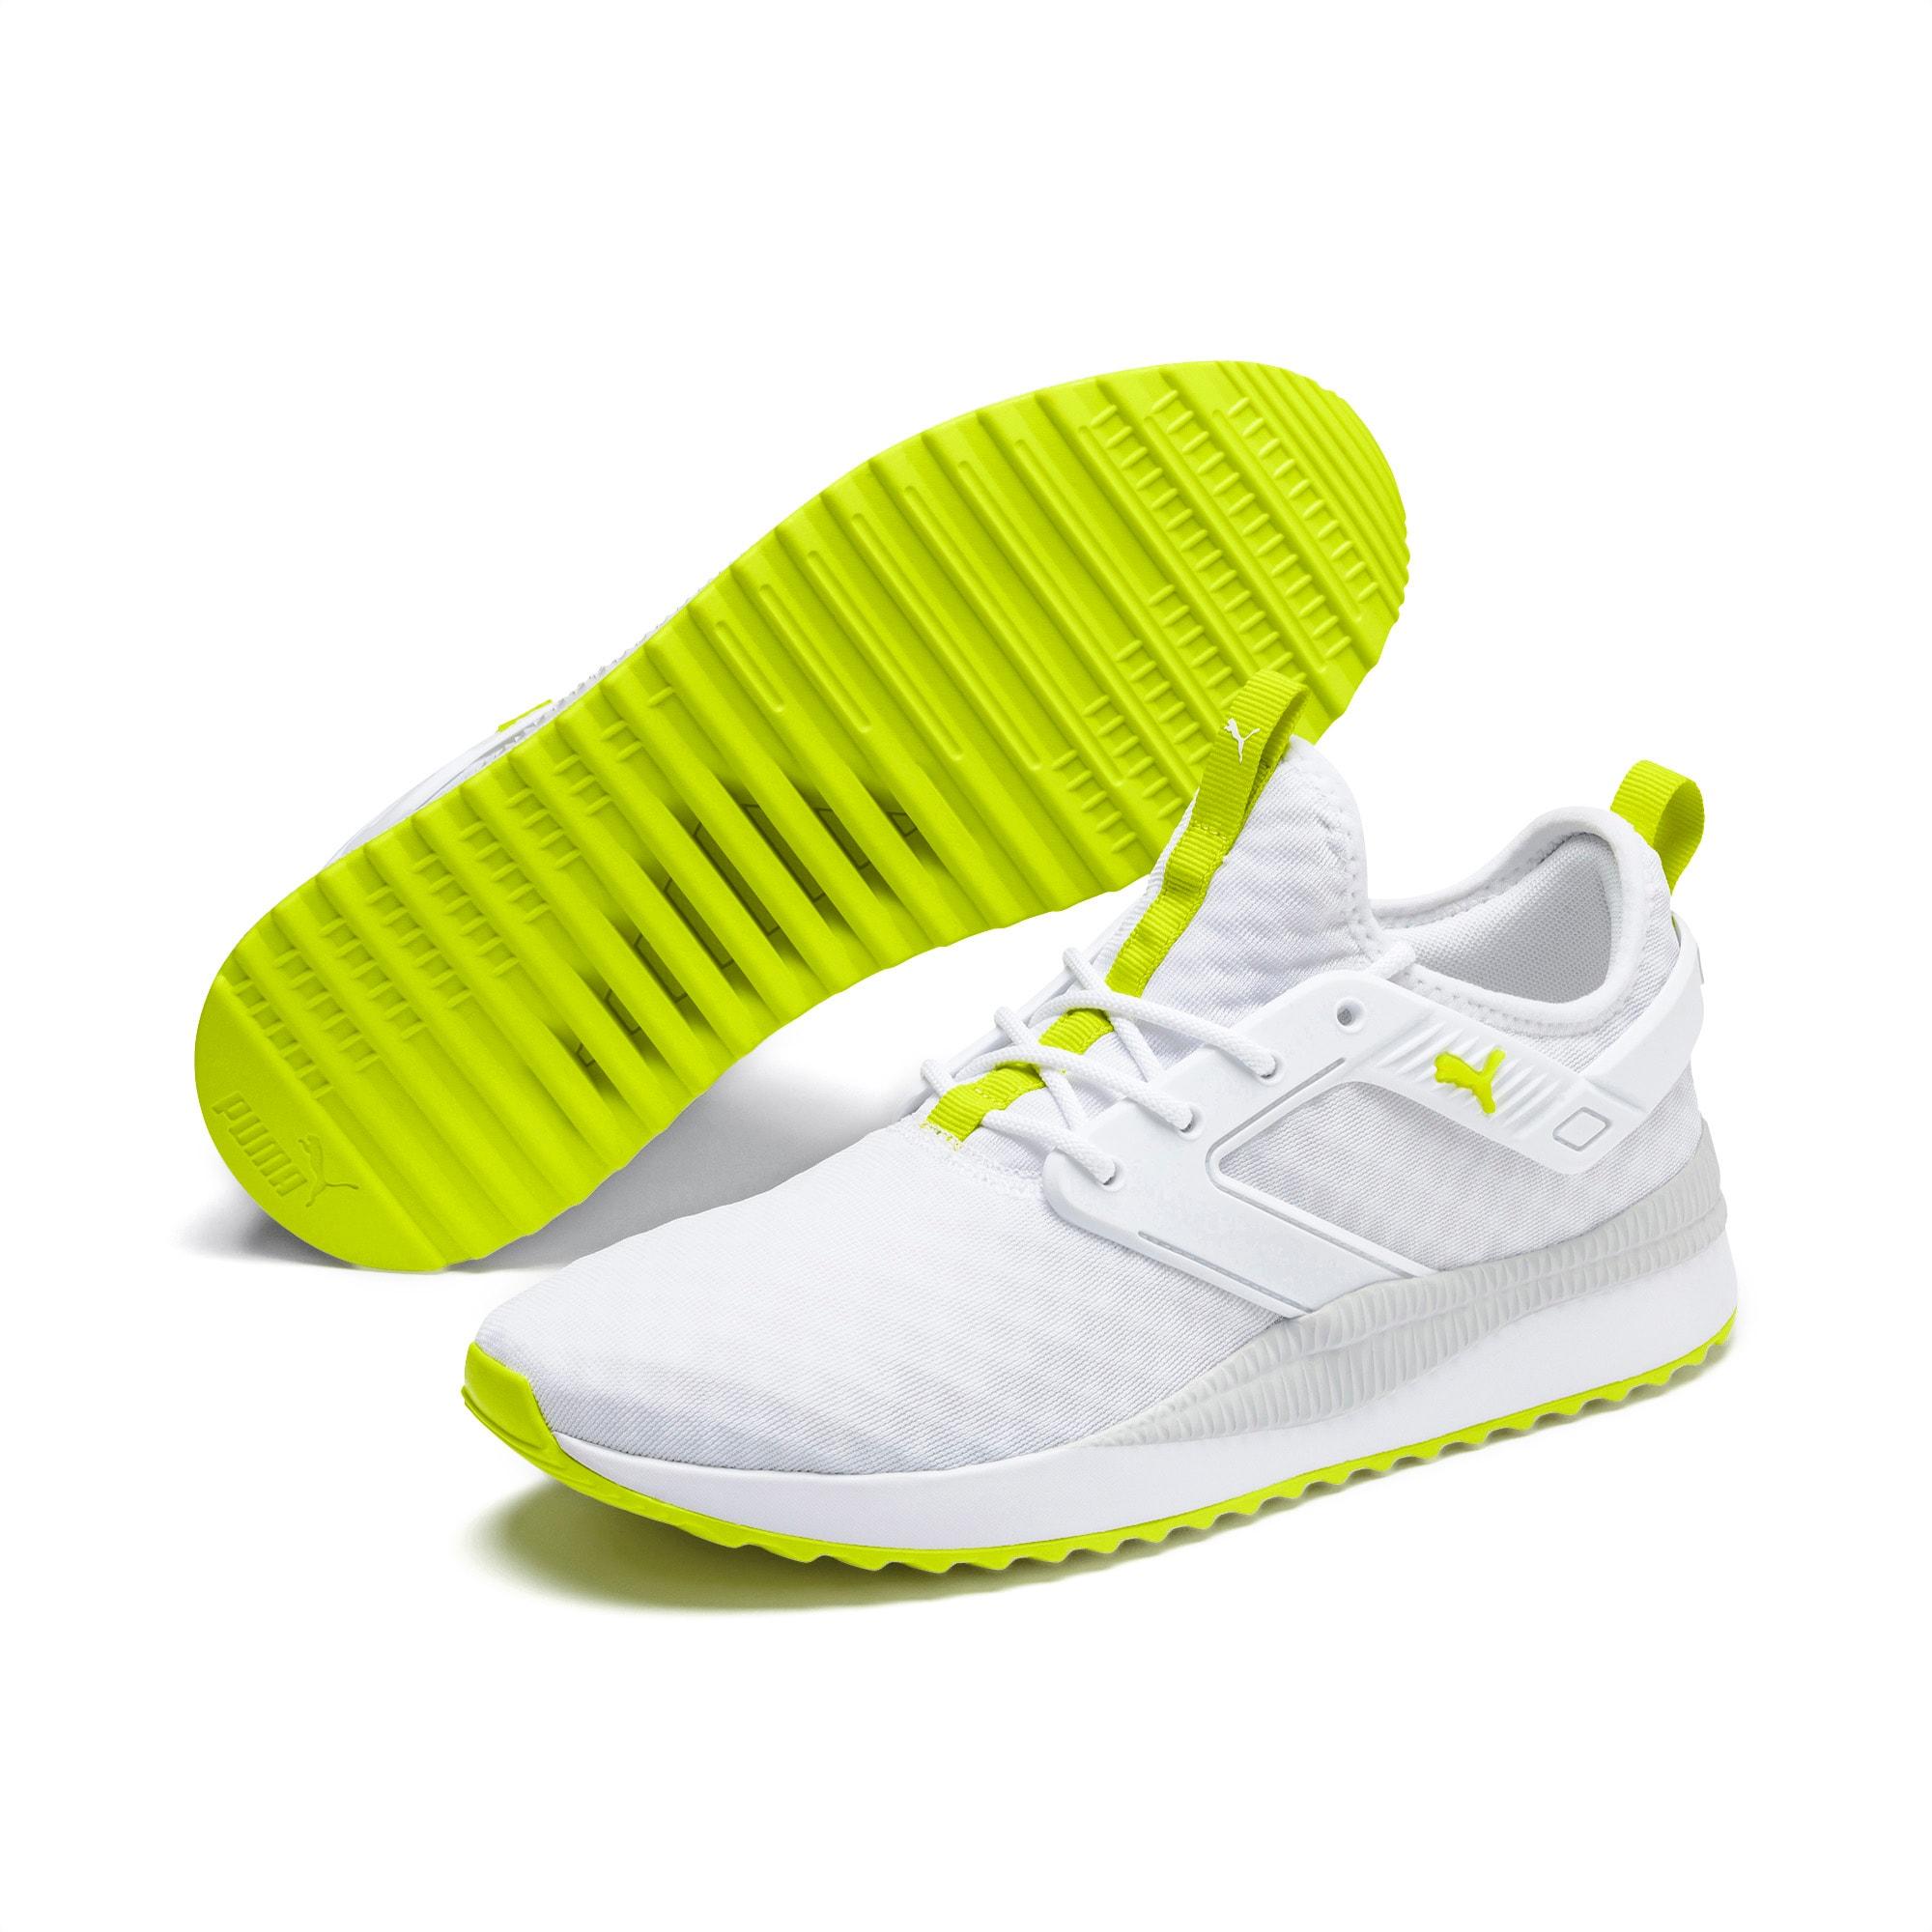 Acquista ora Puma Pacer Next Excel Running Shoes Scarpe